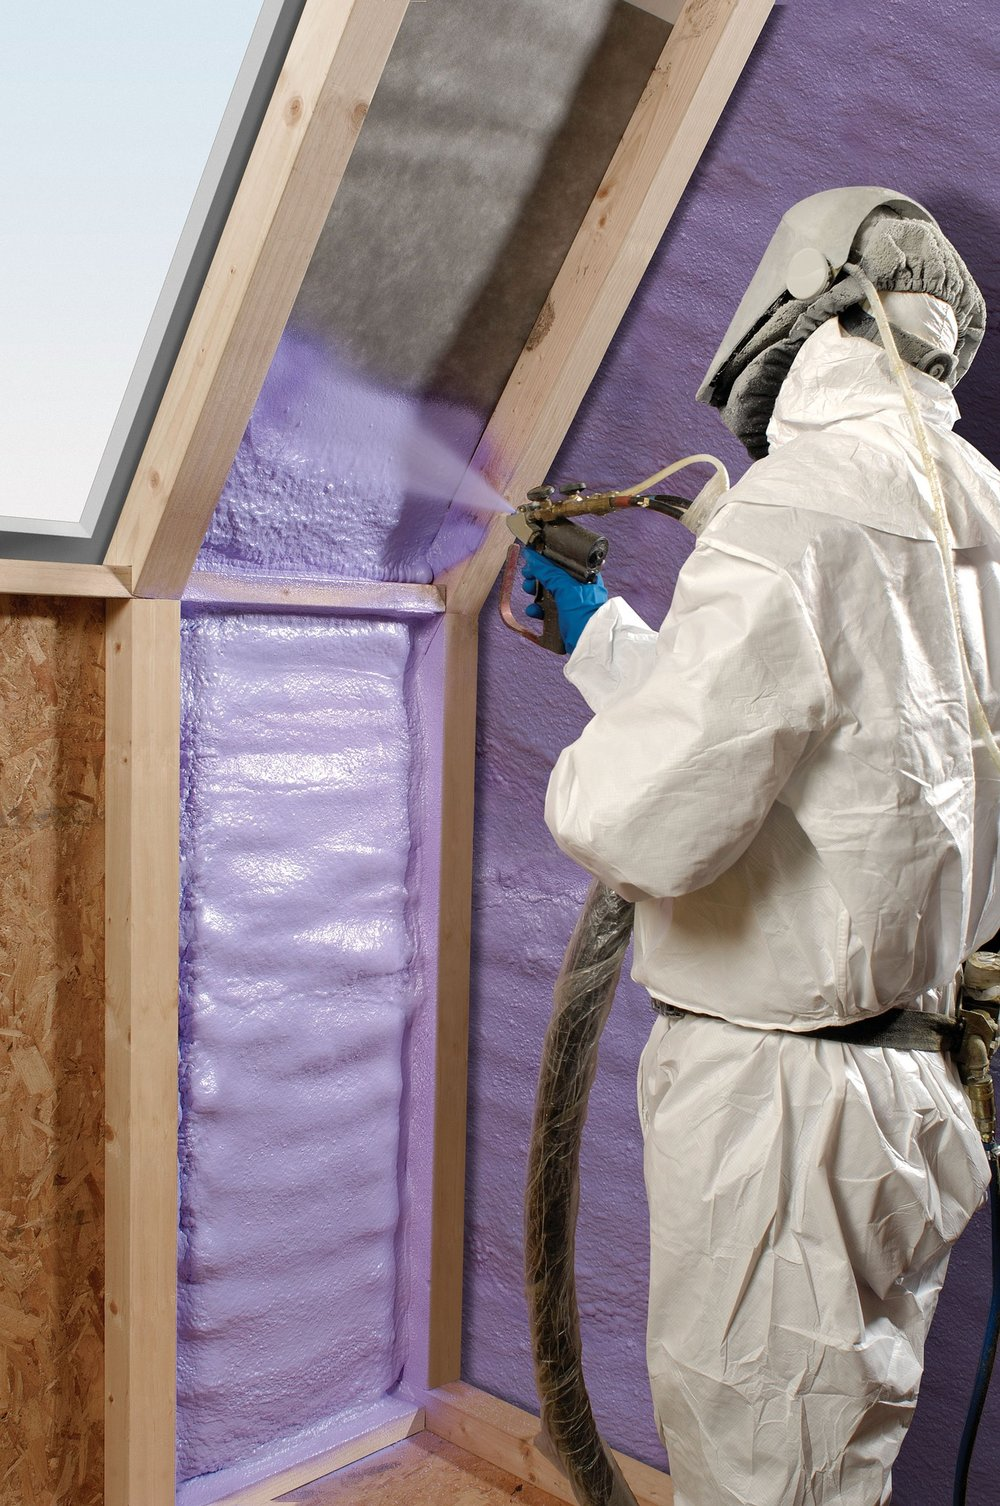 Applying insulation